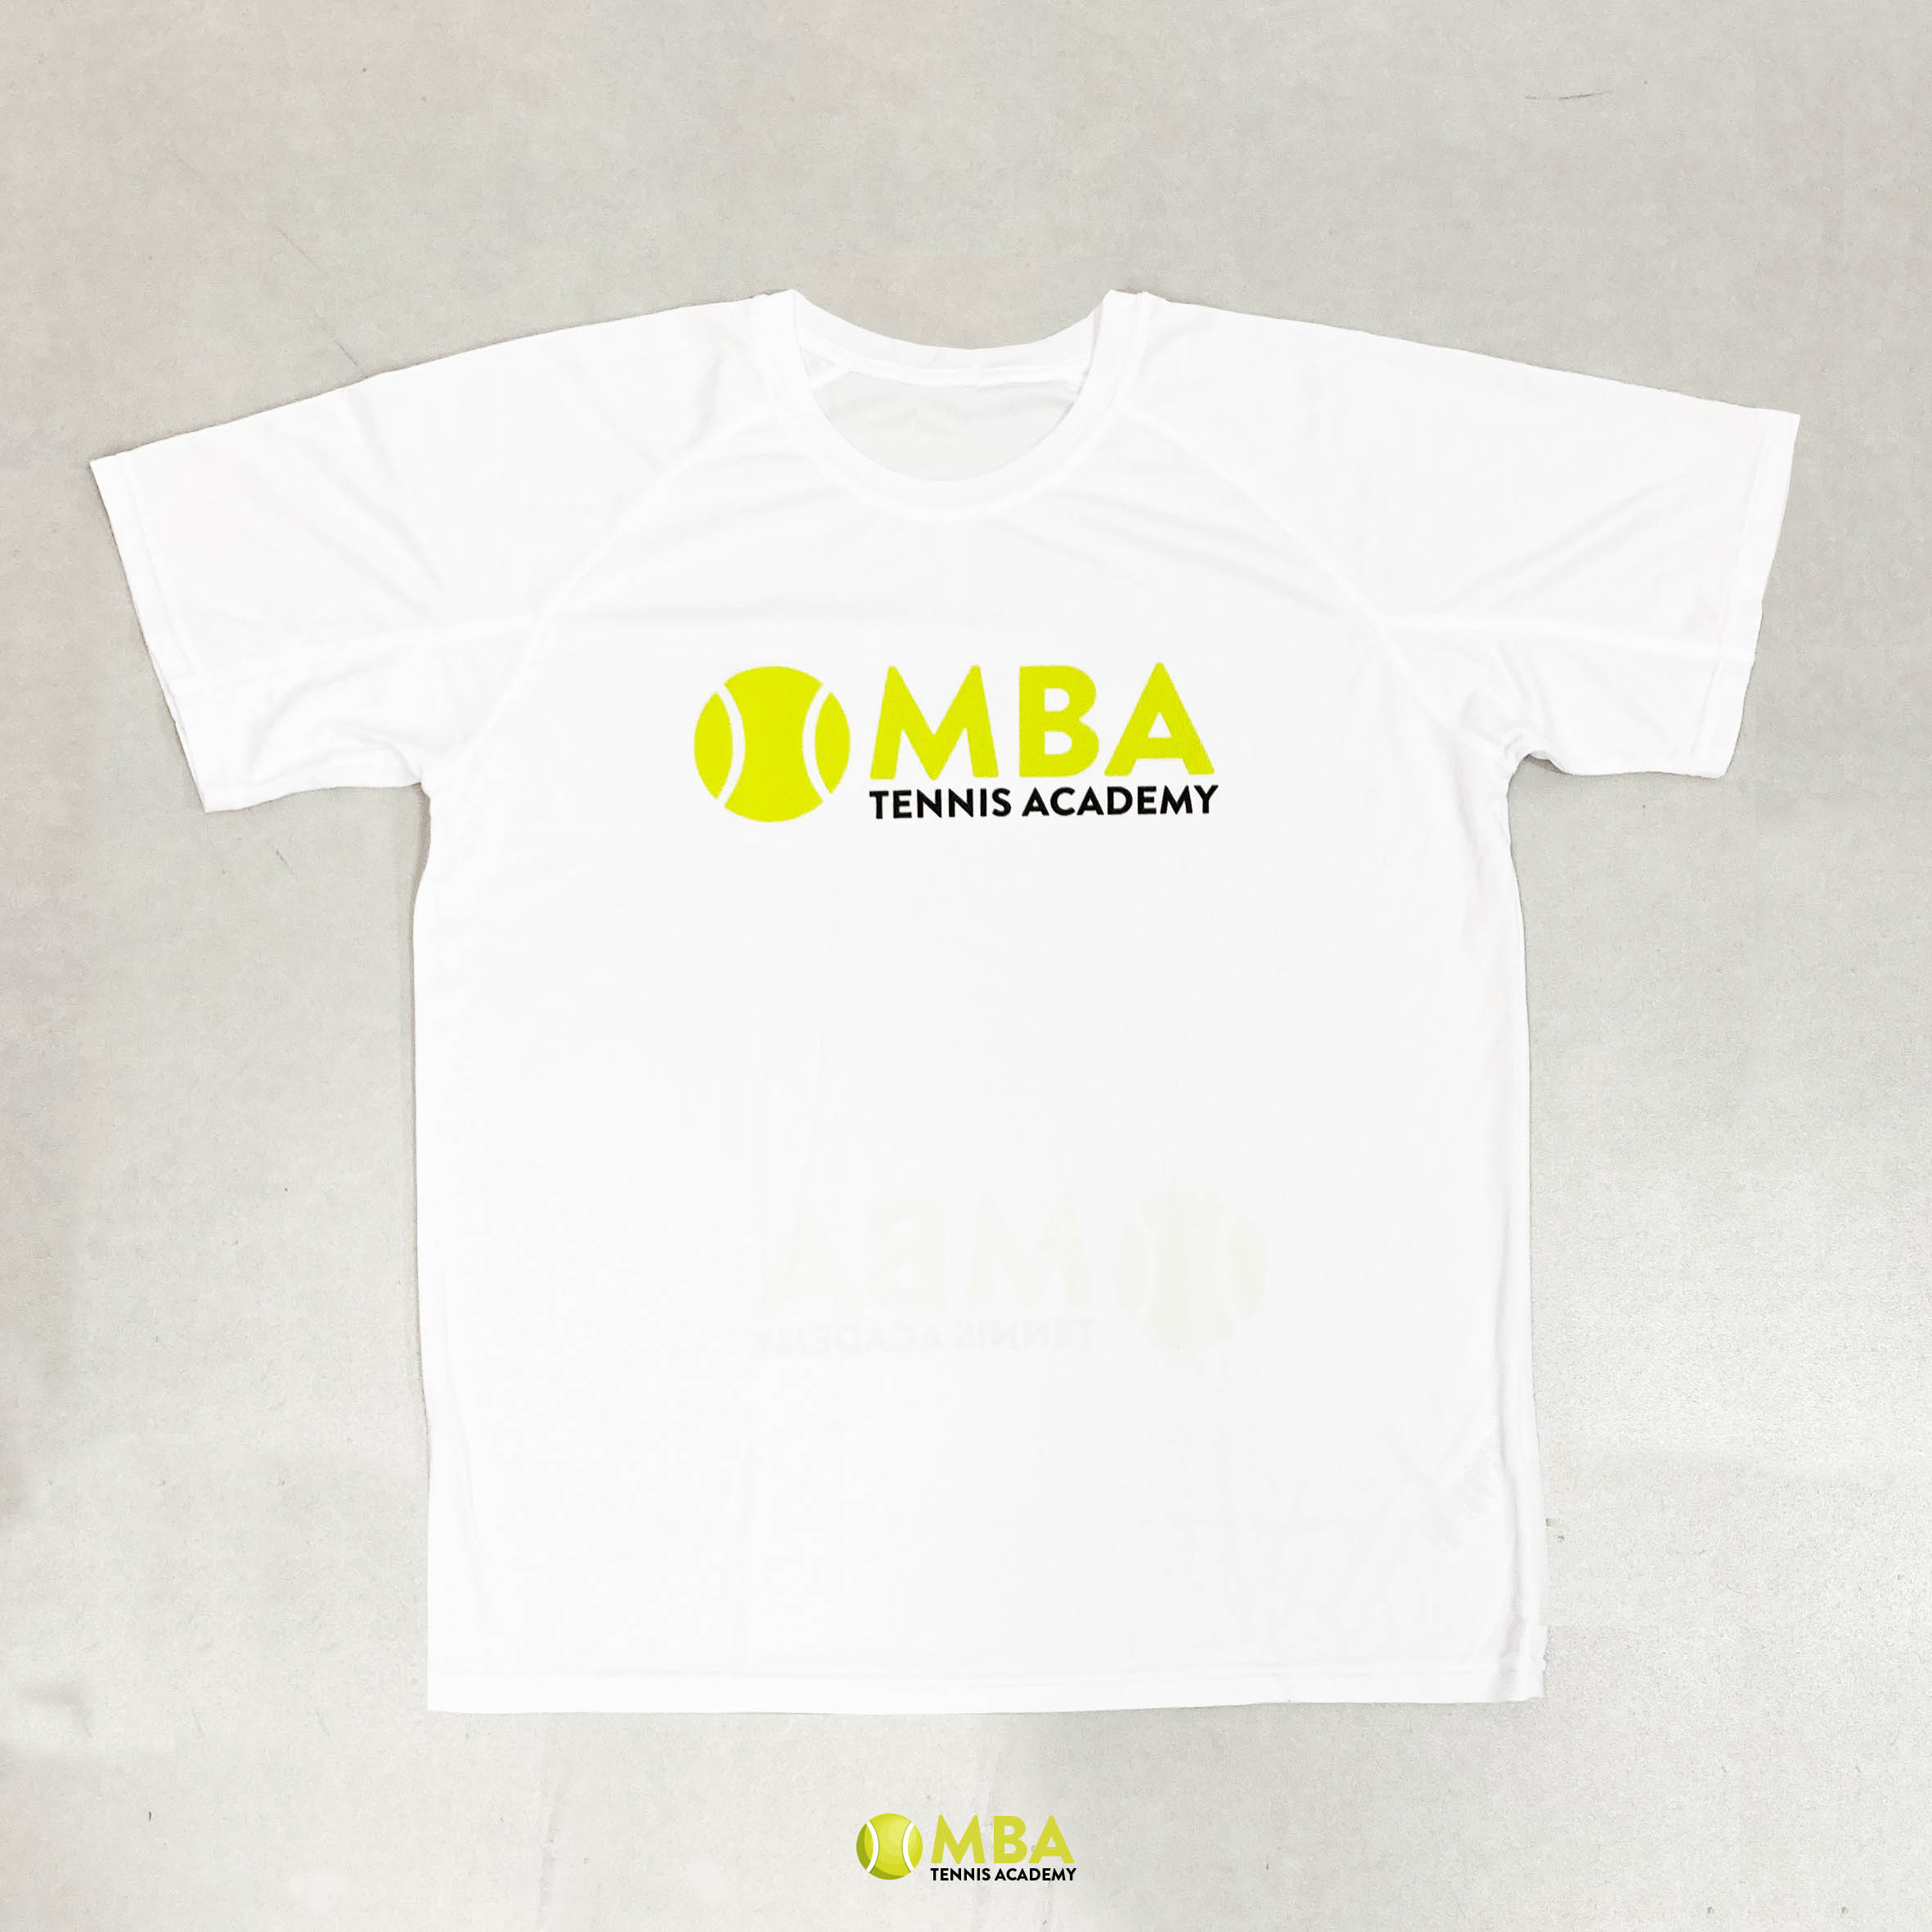 MBA-Tennis-Academy-camiseta-blanca-hombre-2